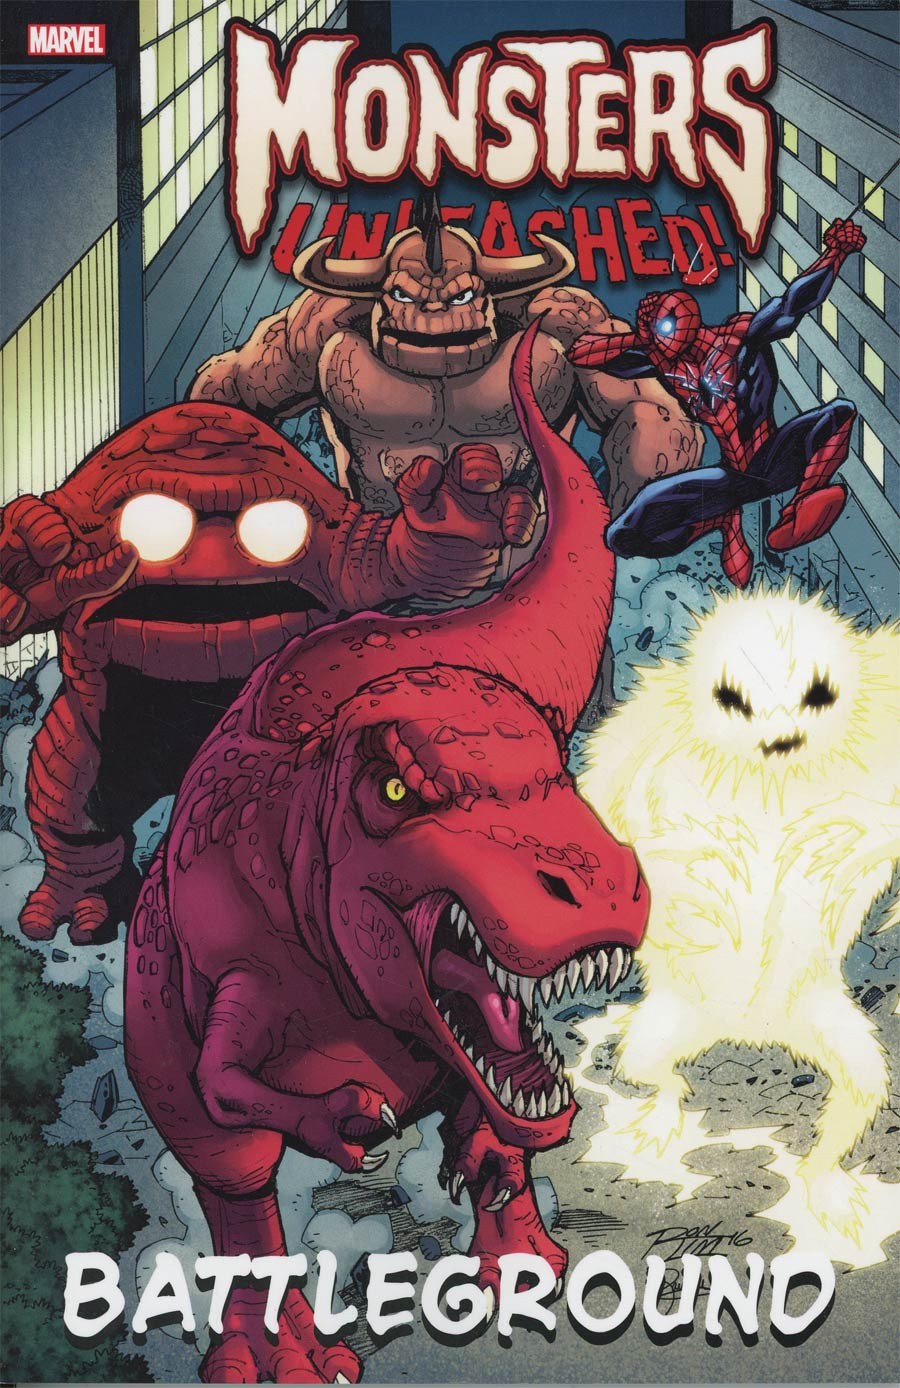 Monsters Unleashed Battleground TP